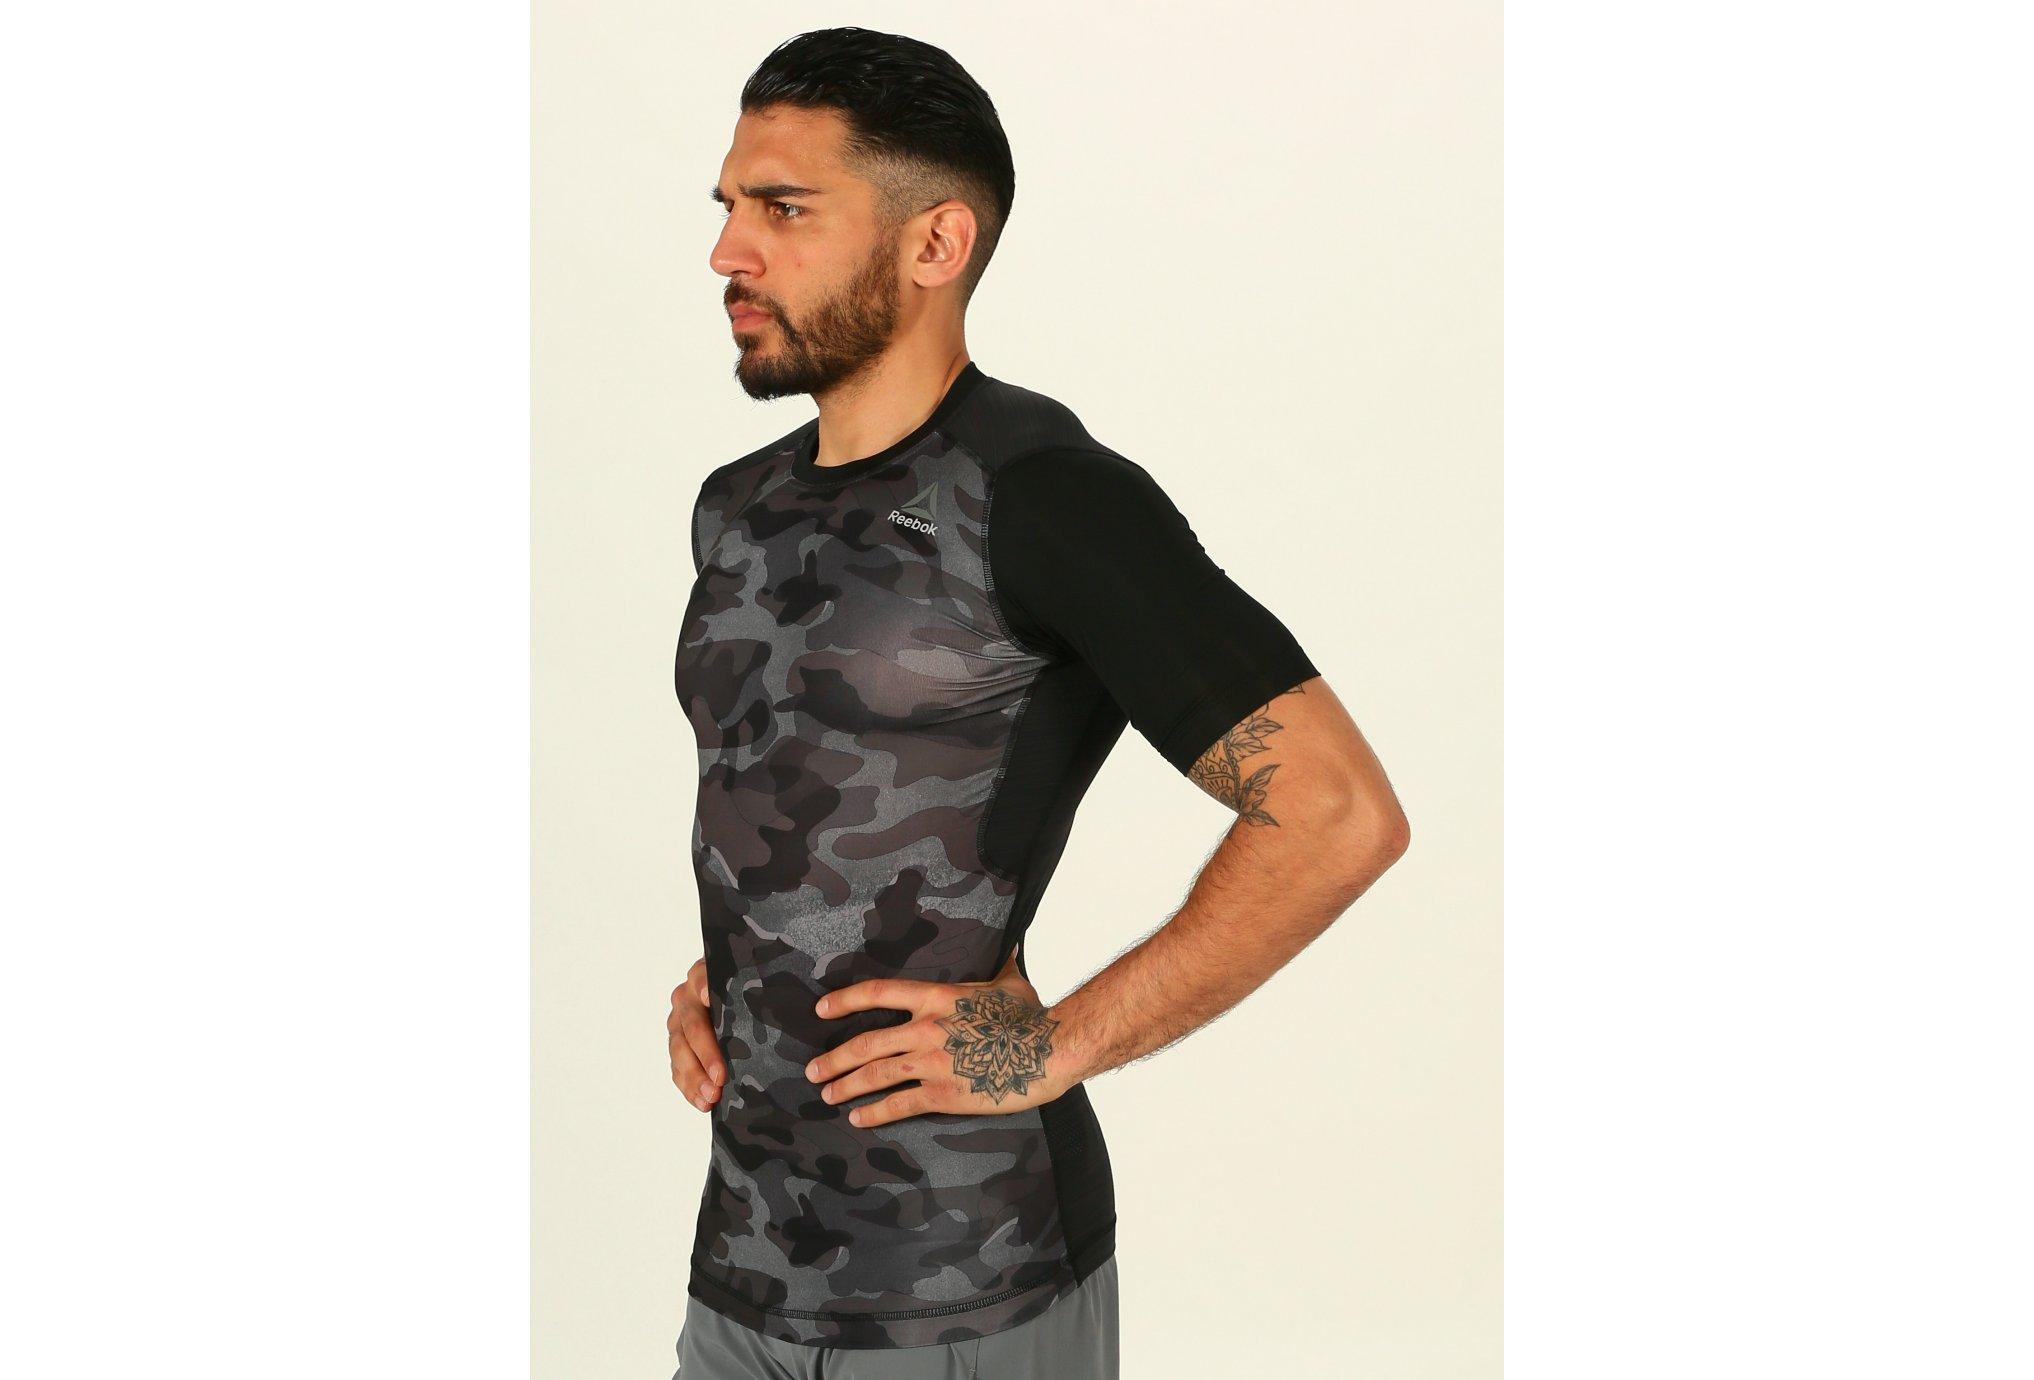 Reebok Camiseta manga corta de Compresión ActivChill Print vêtement running homme